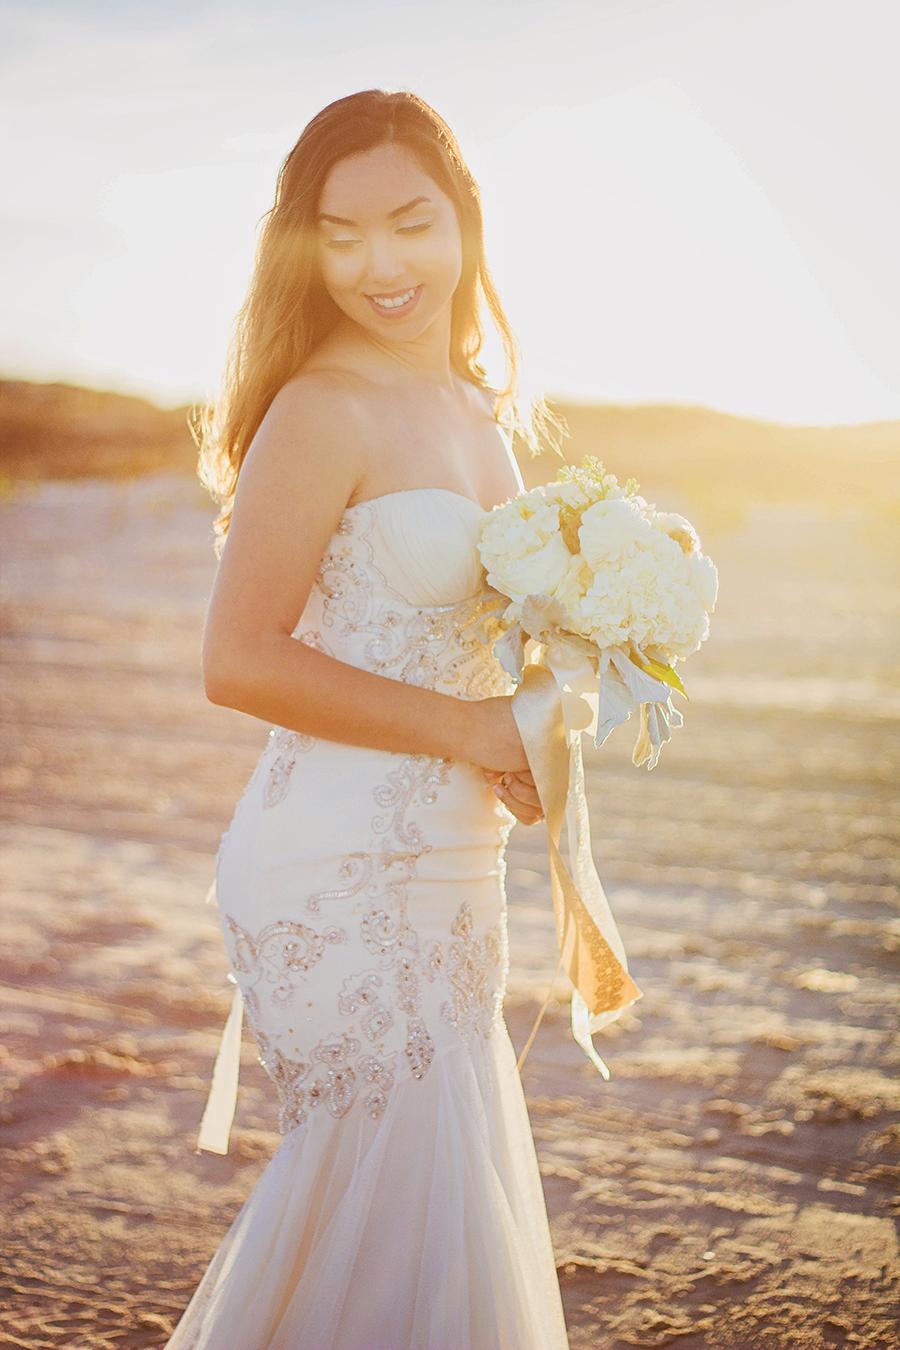 Sunset Ceremony | Beach Wedding